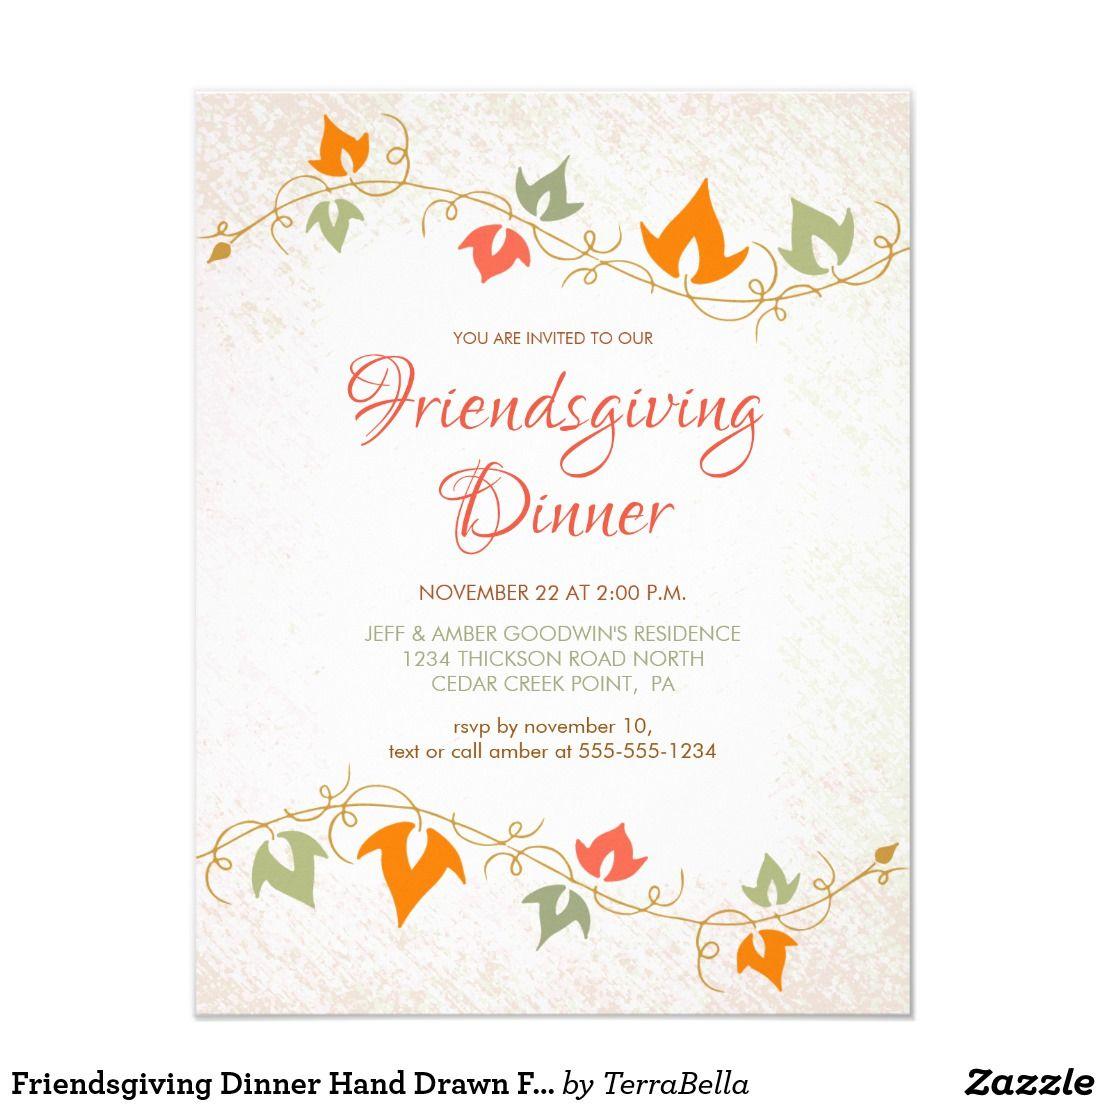 Friendsgiving Dinner Hand Drawn Fall Ivy Vine Invitation